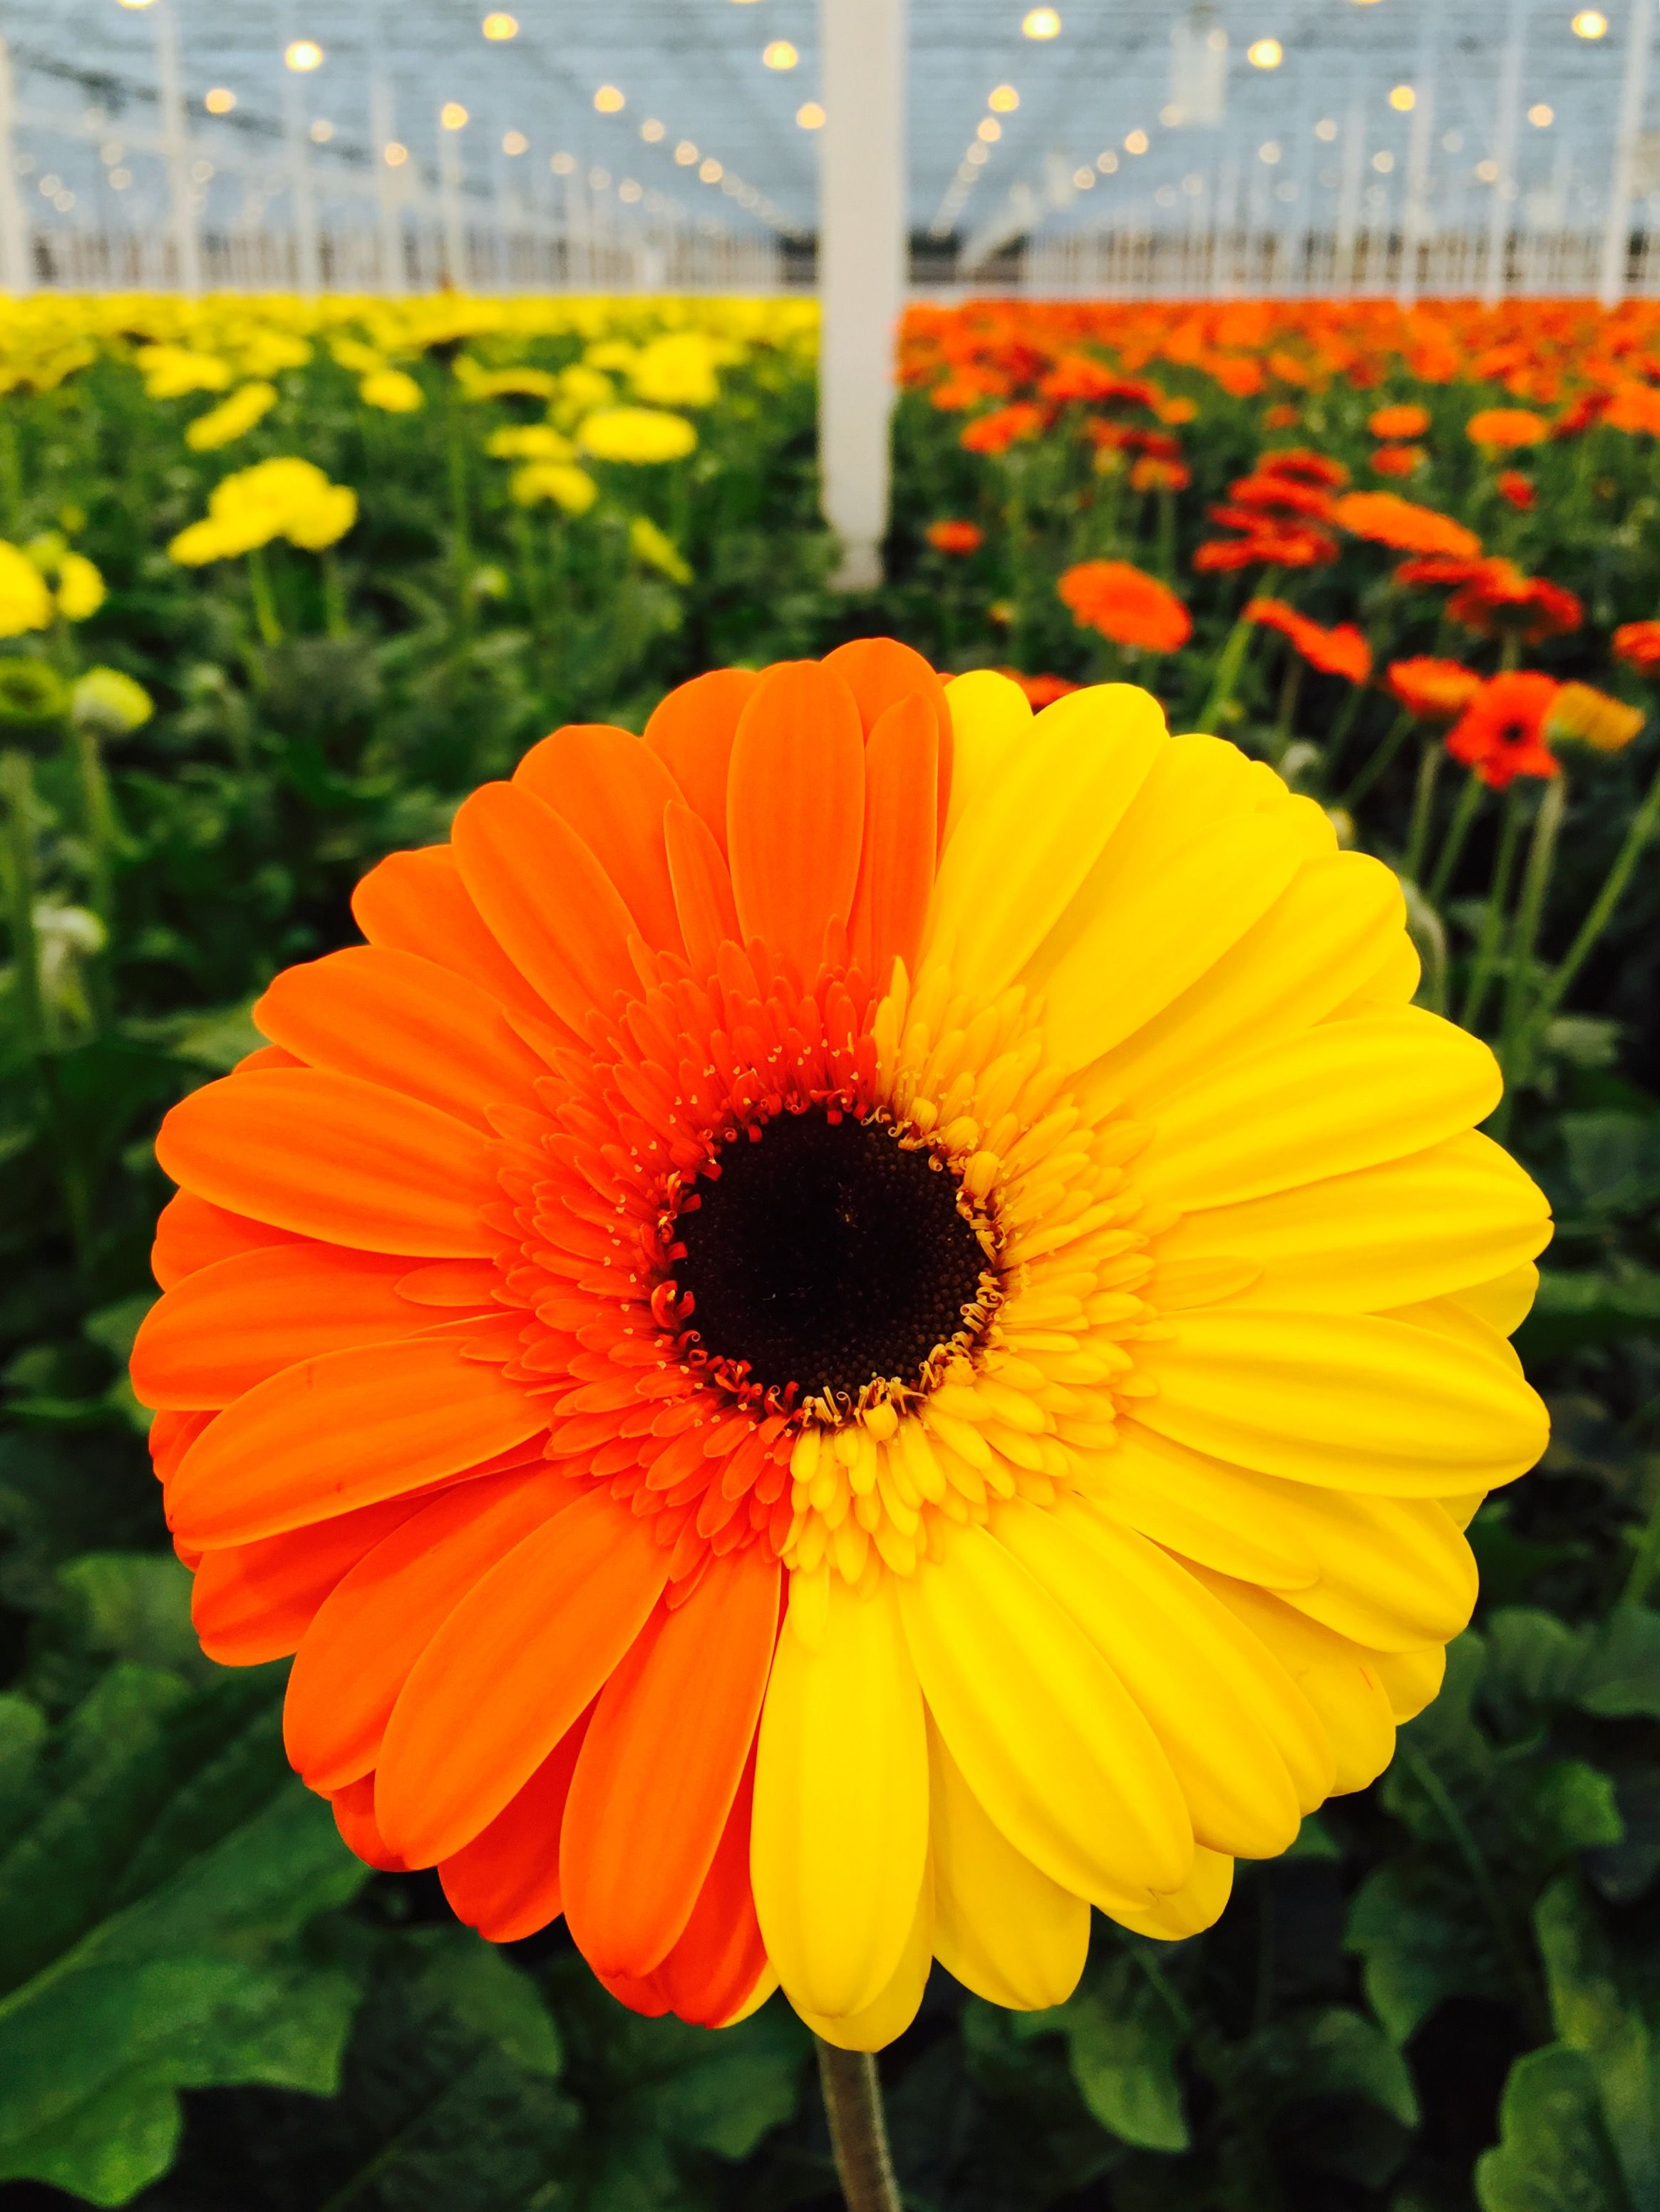 Home Gerbera Daisy Mother Nature Gerbera